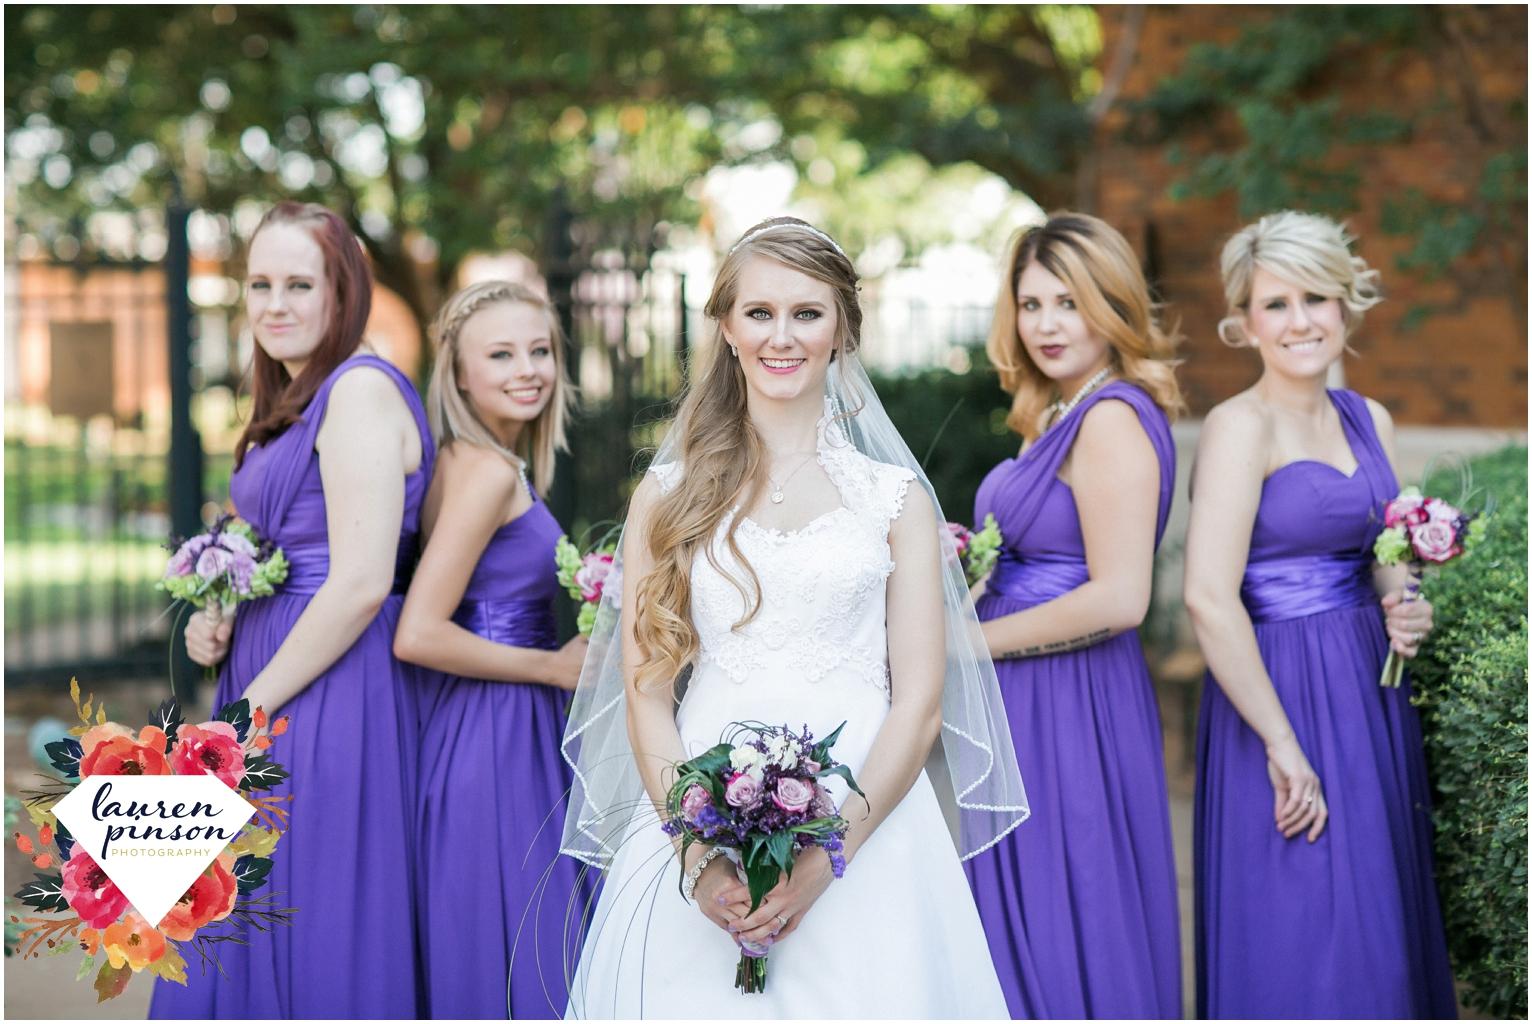 wichita-falls-wedding-photography-at-fain-presbyterian-church-and-the-wellington-timeless-classic-modern-photographer_1235.jpg